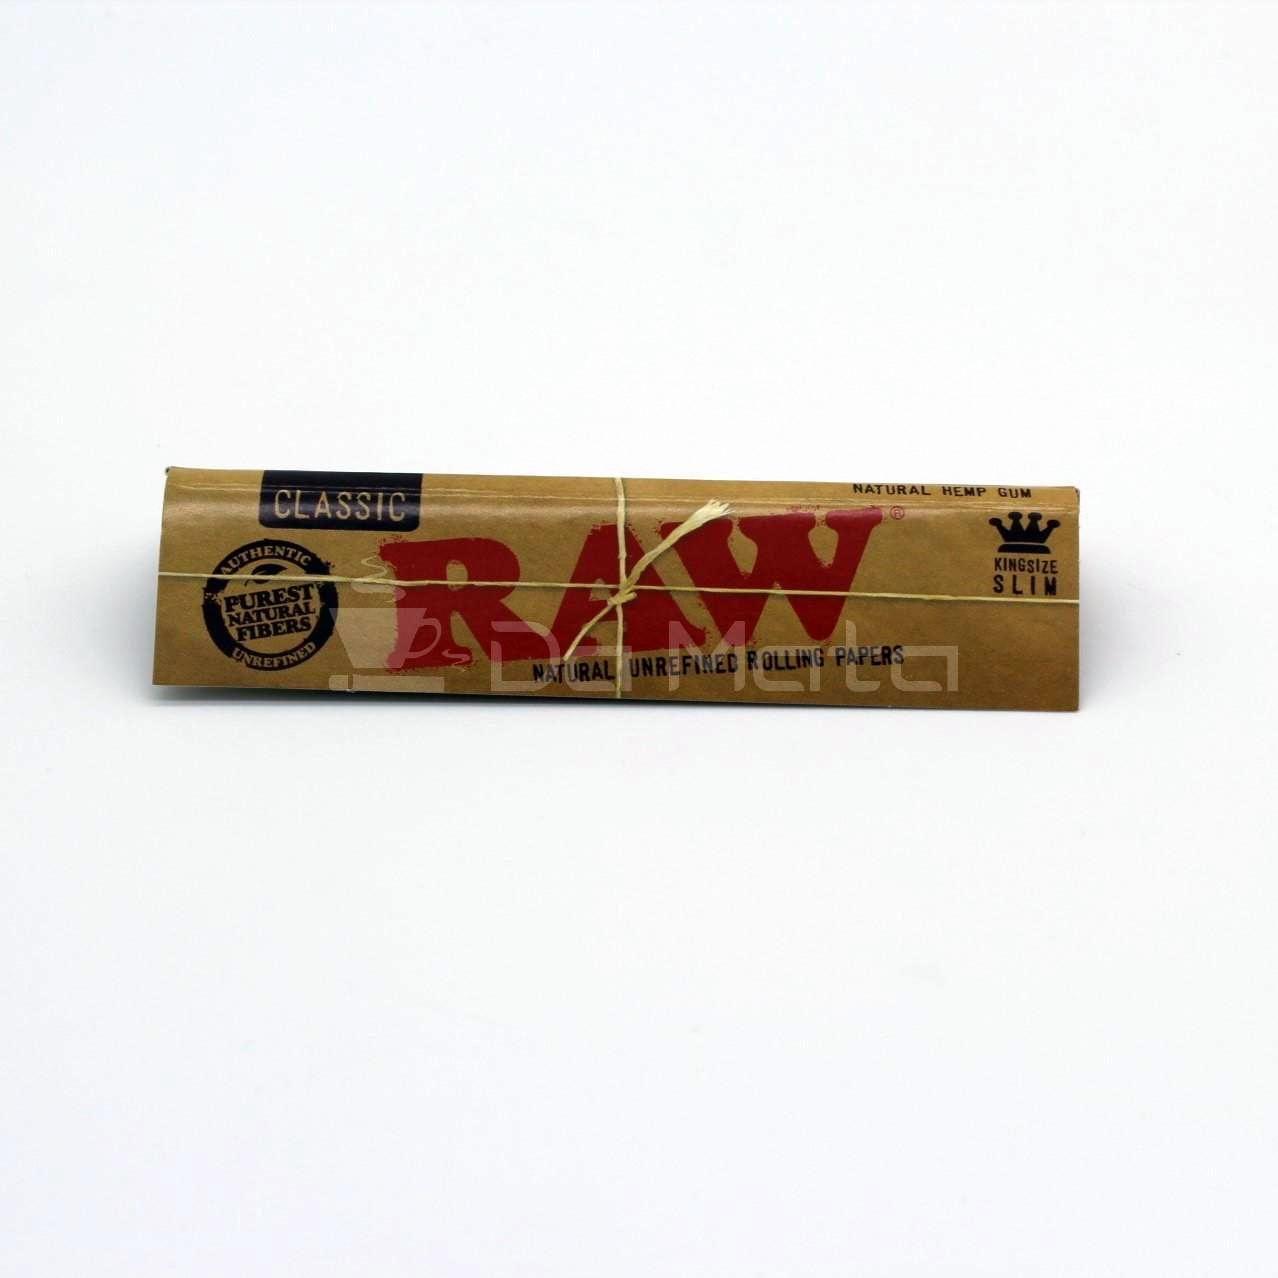 Seda Raw Classic - King Size